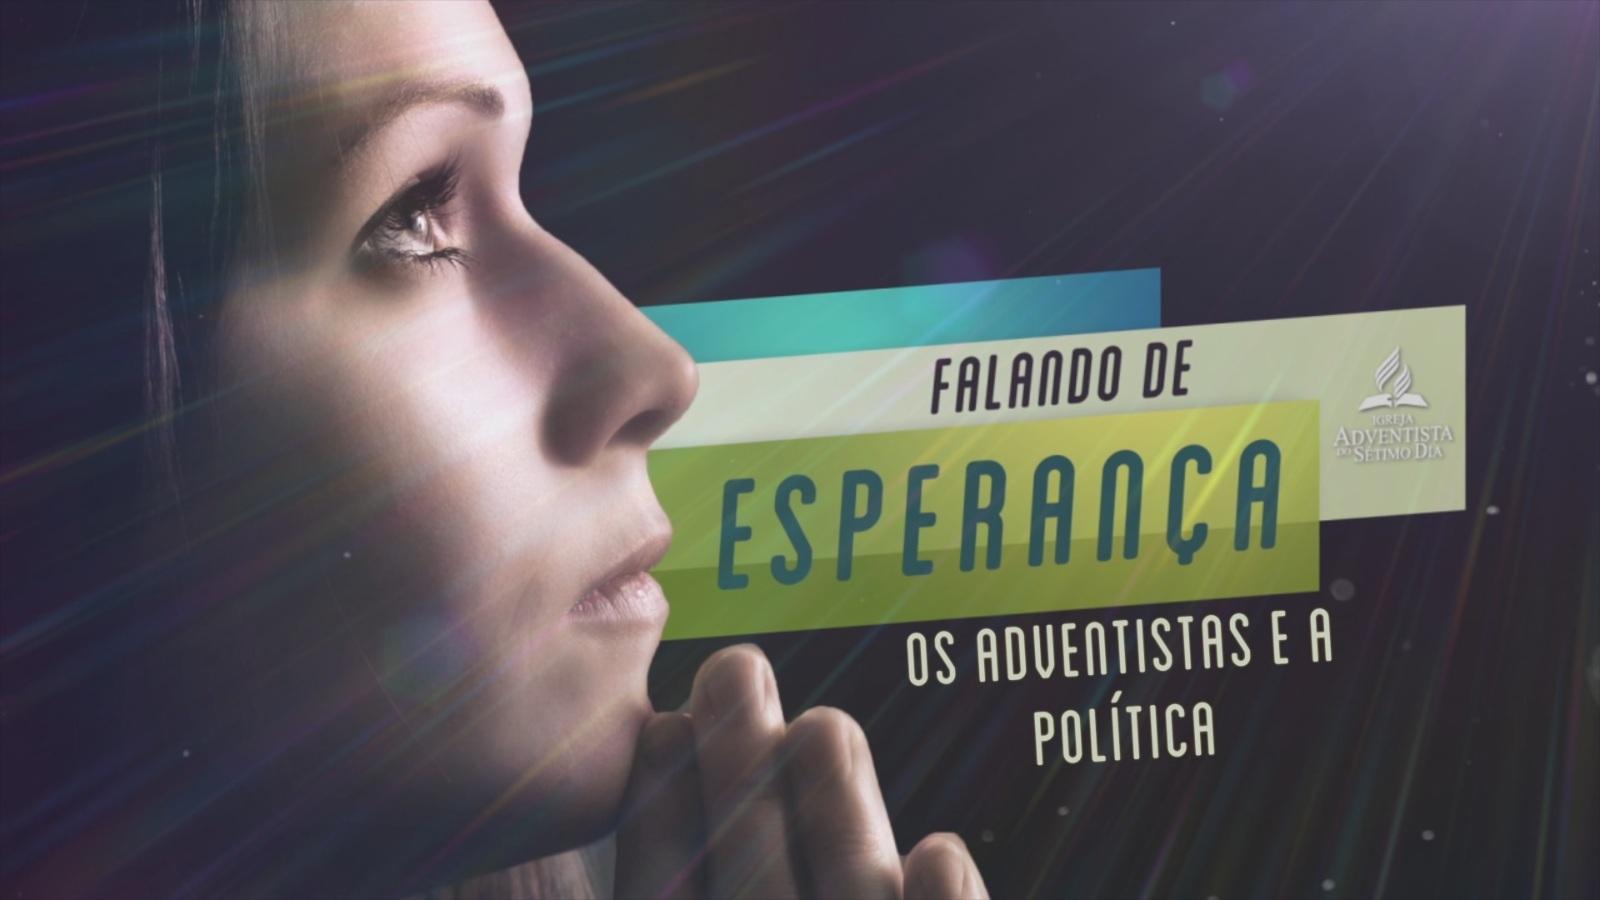 Vídeo-apresenta-visao-dos-adventistas-sobre-a-politica